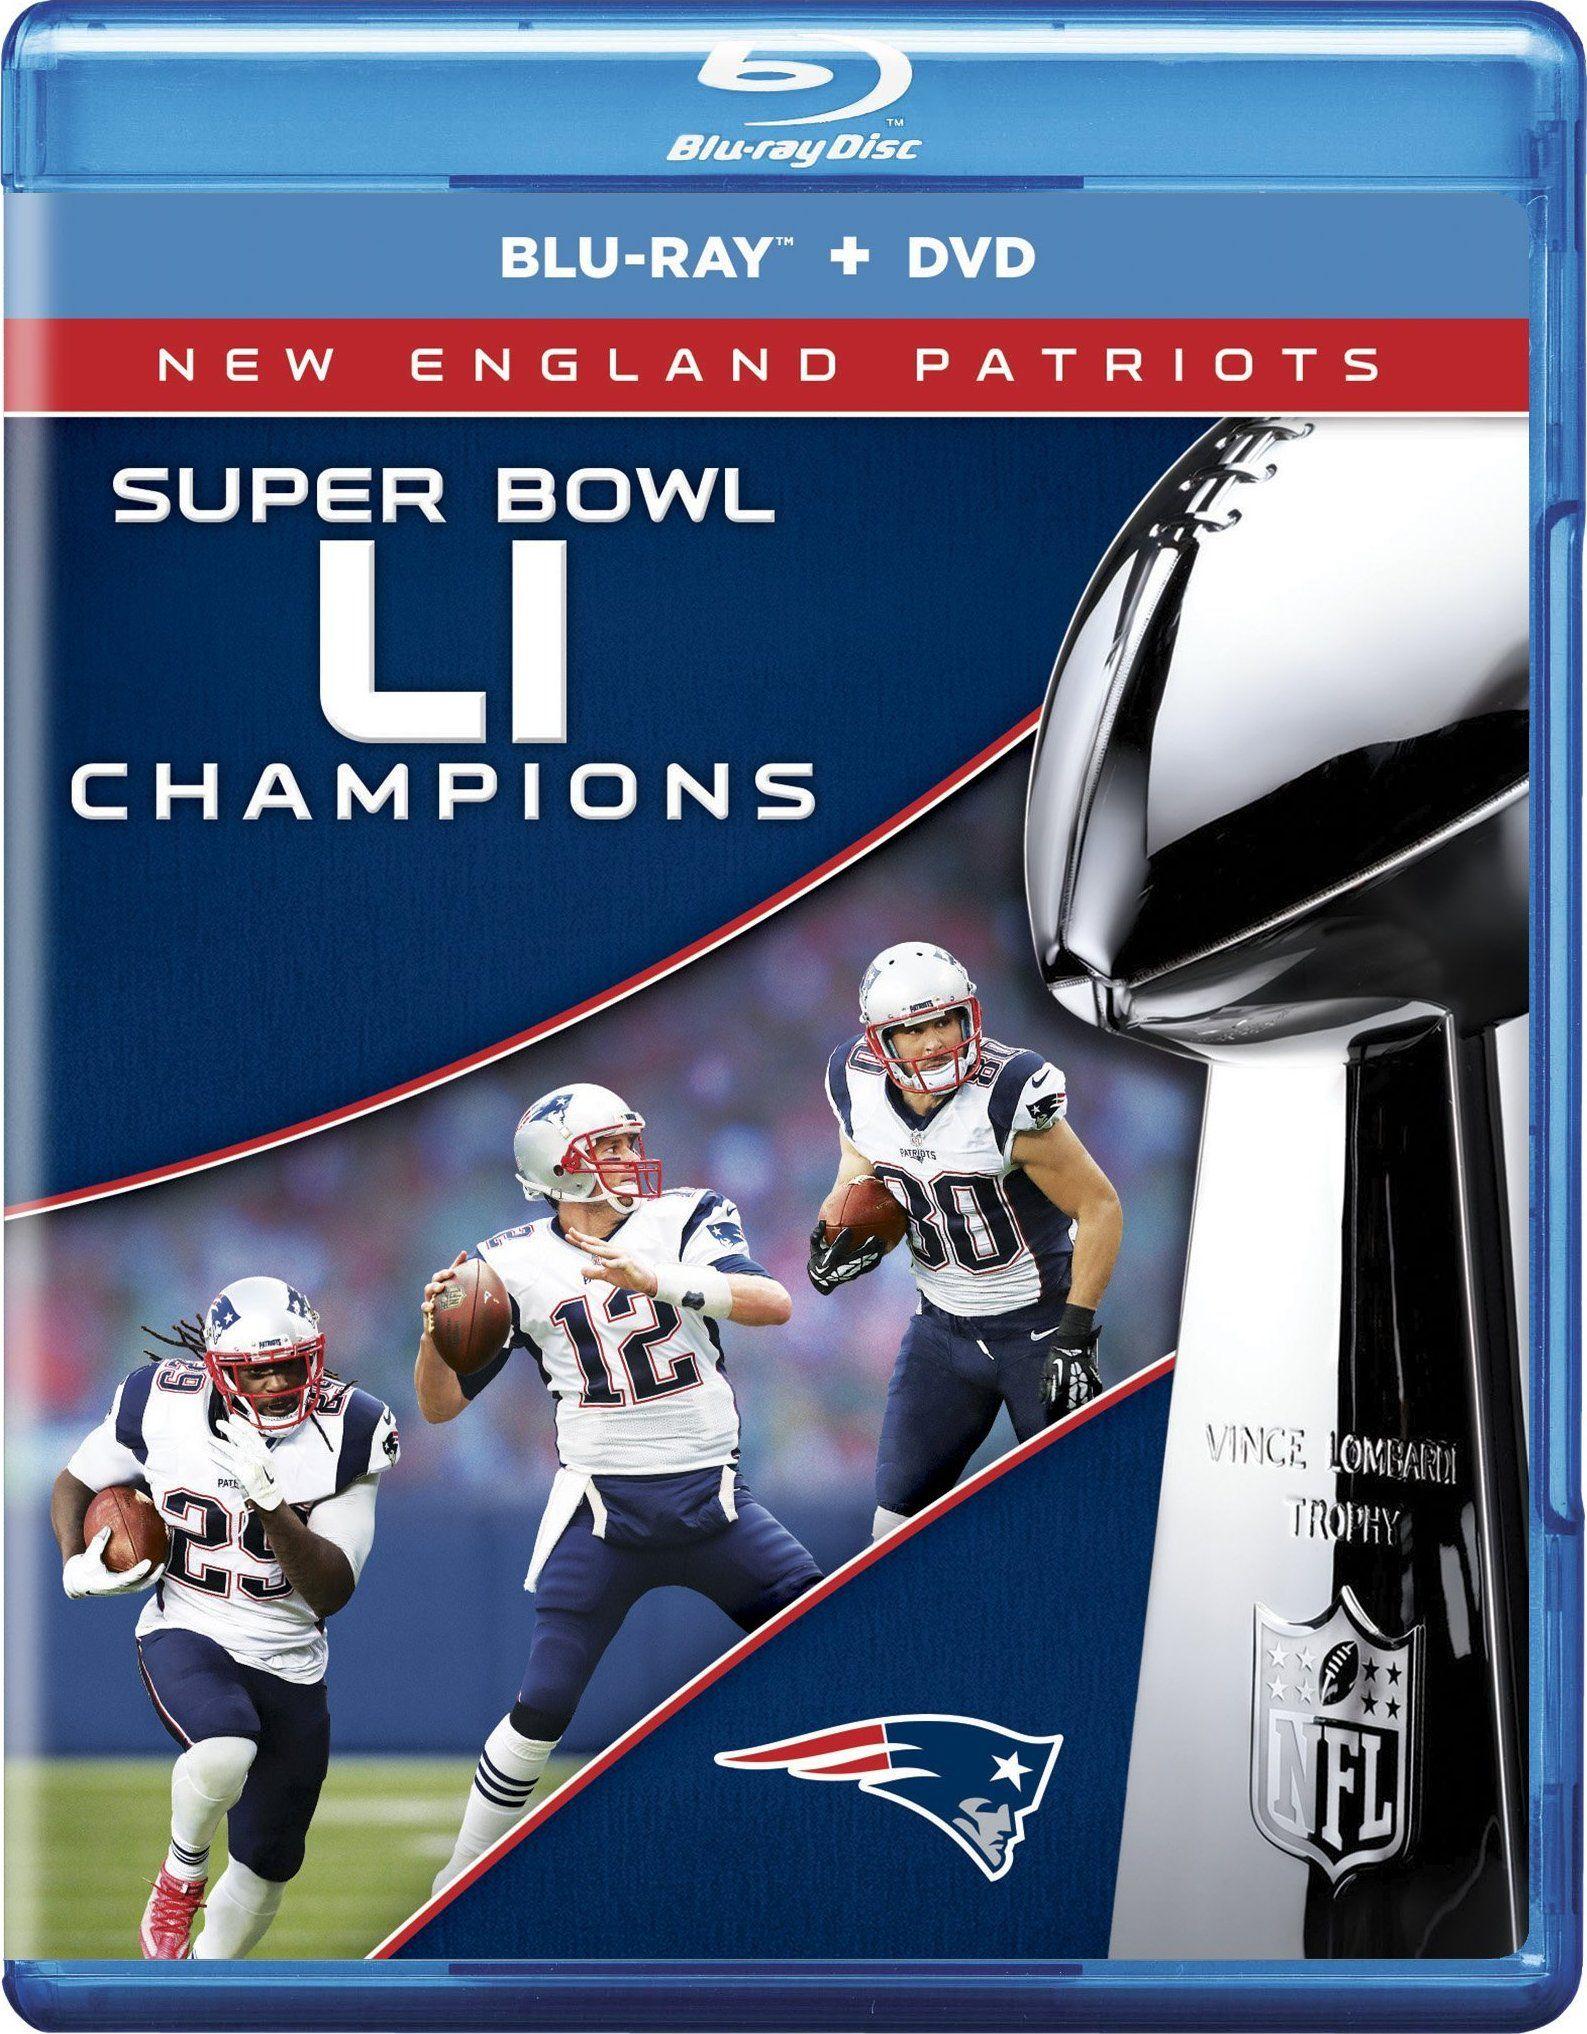 Nfl Super Bowl Li Champions 2017 Blu Ray Super Bowl Li Super Bowl New England Patriots